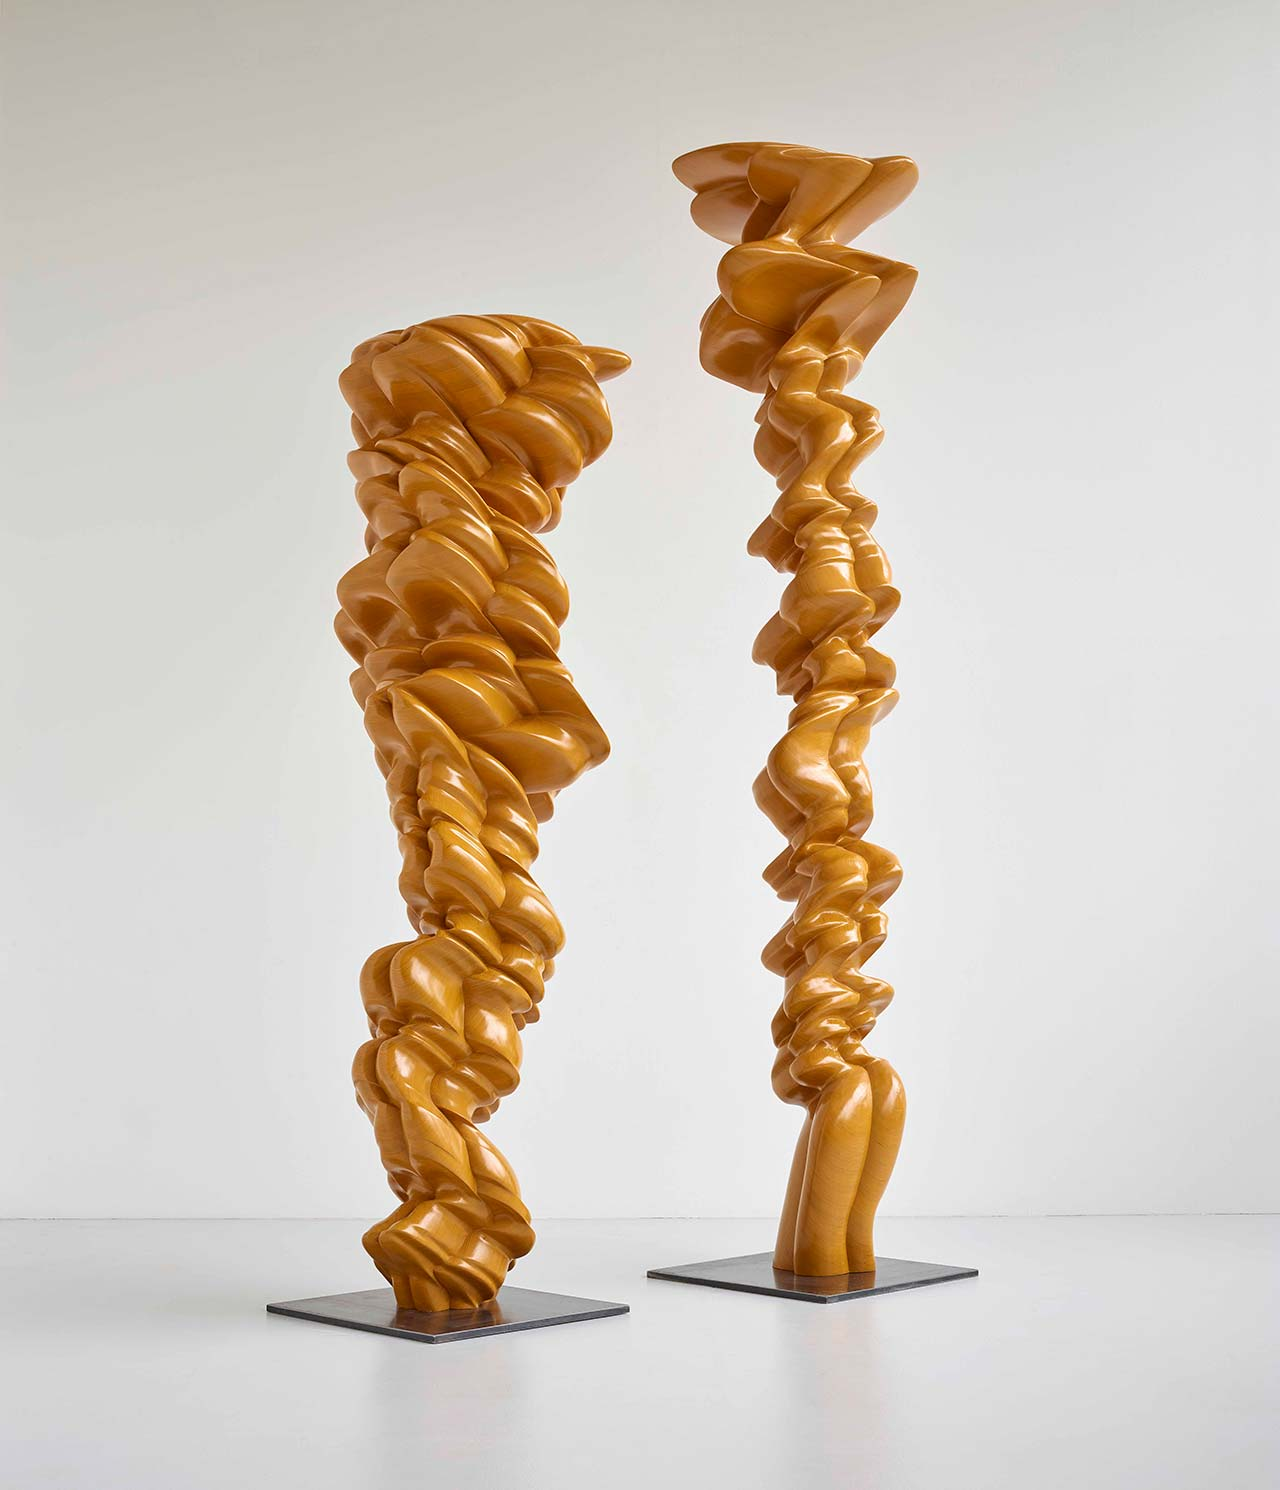 Tony Cragg, Pair,2014. Wood, 410 x 99 x 76cm, 329 x 92 x 127cm. Photoby Michael Richter.© VG Bild-Kunst Bonn 2016.